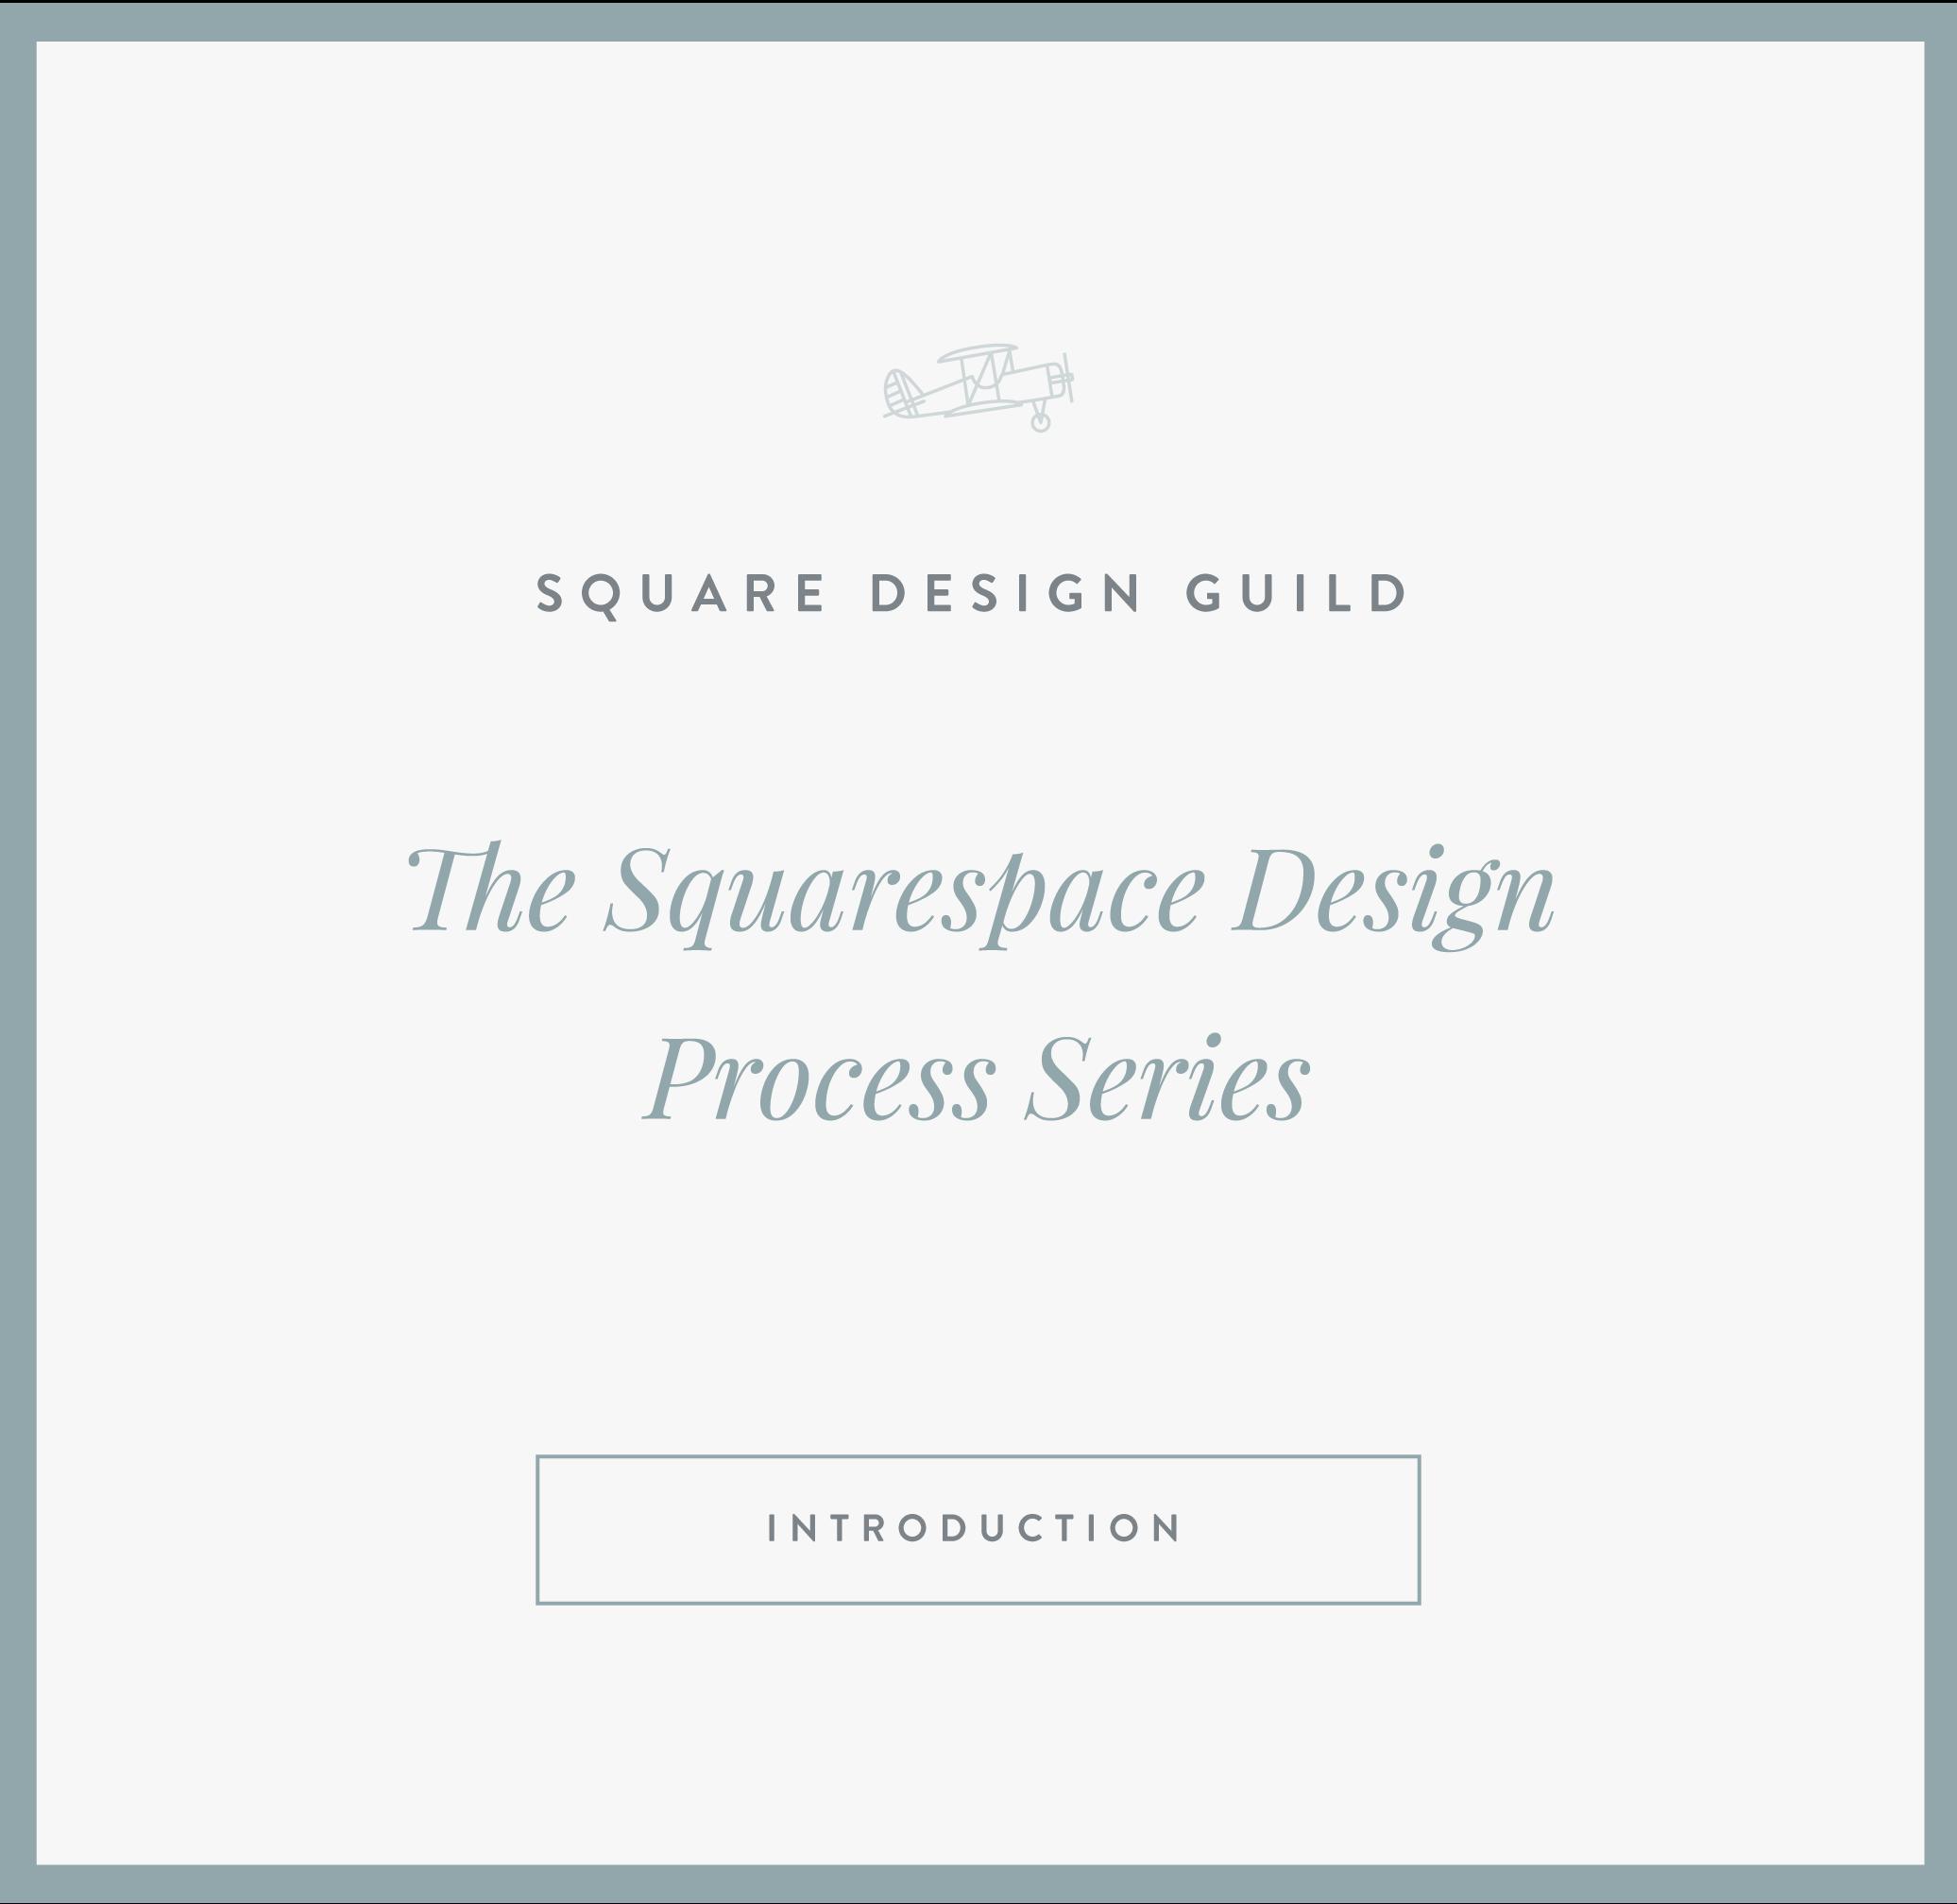 Squarespace Design Guild | The Squarespace Process Series - Intro